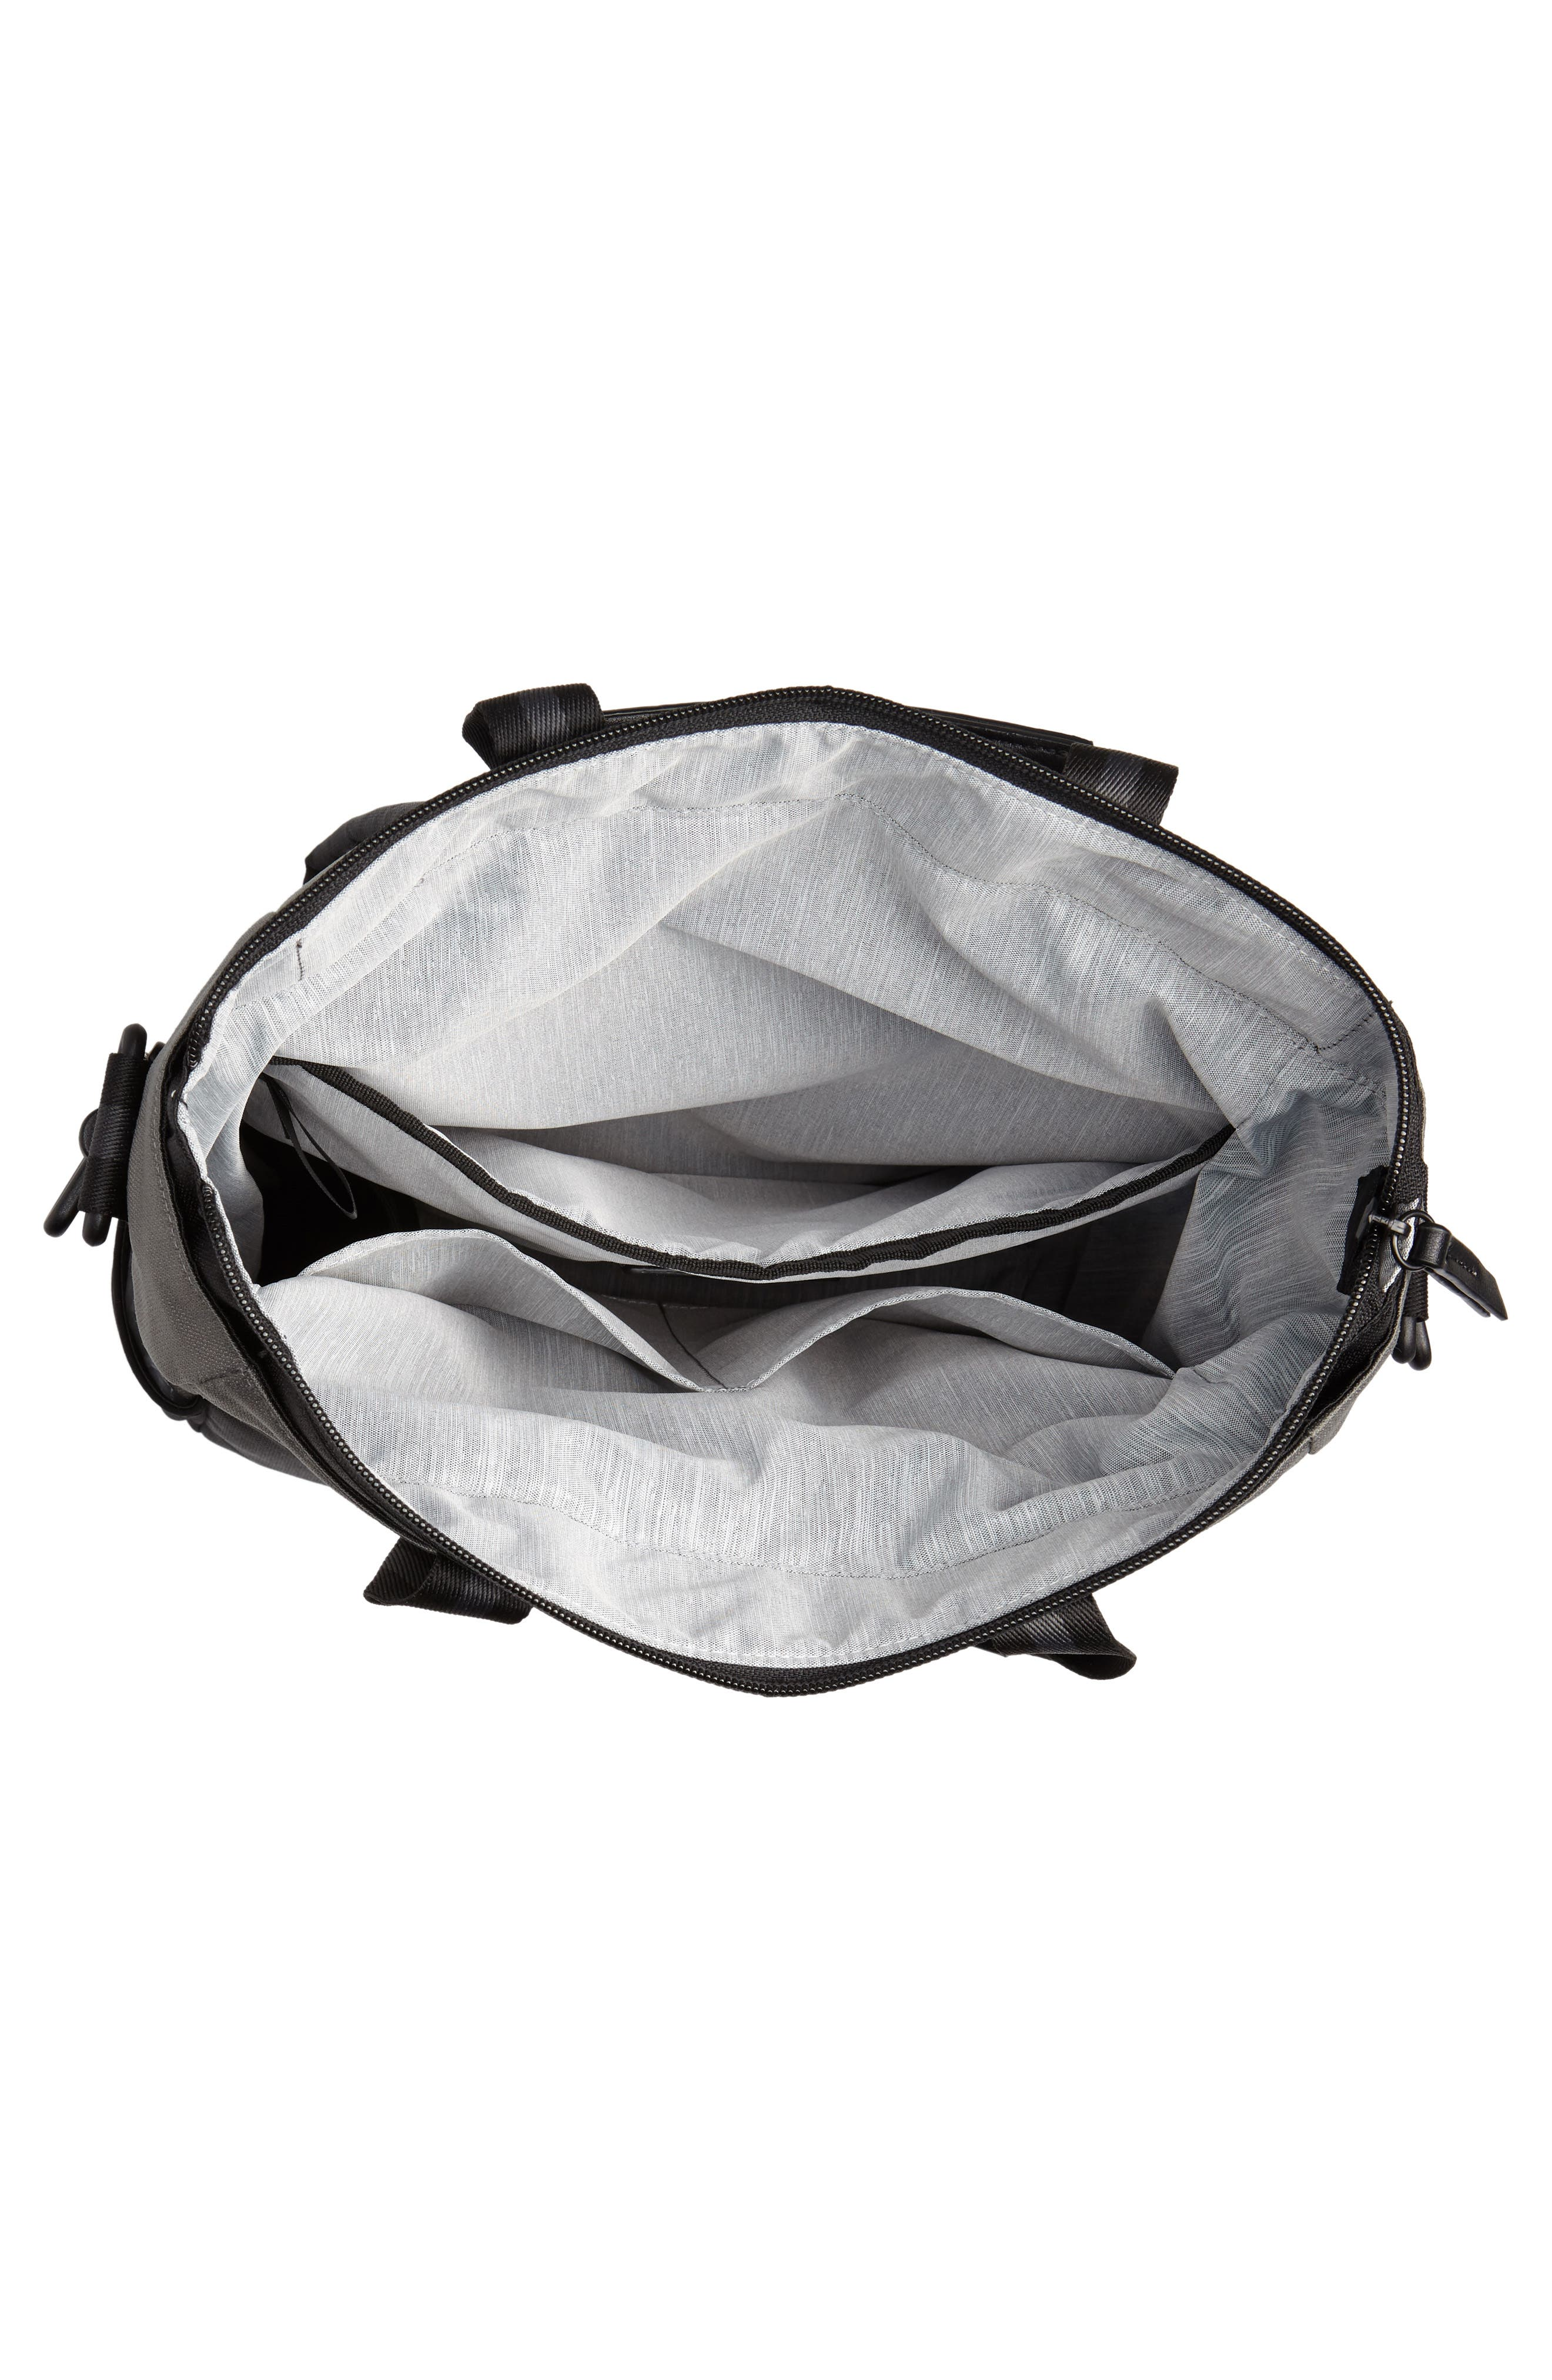 Camden RFID Convertible Backpack,                             Alternate thumbnail 6, color,                             GREY FLINT/ BLACK